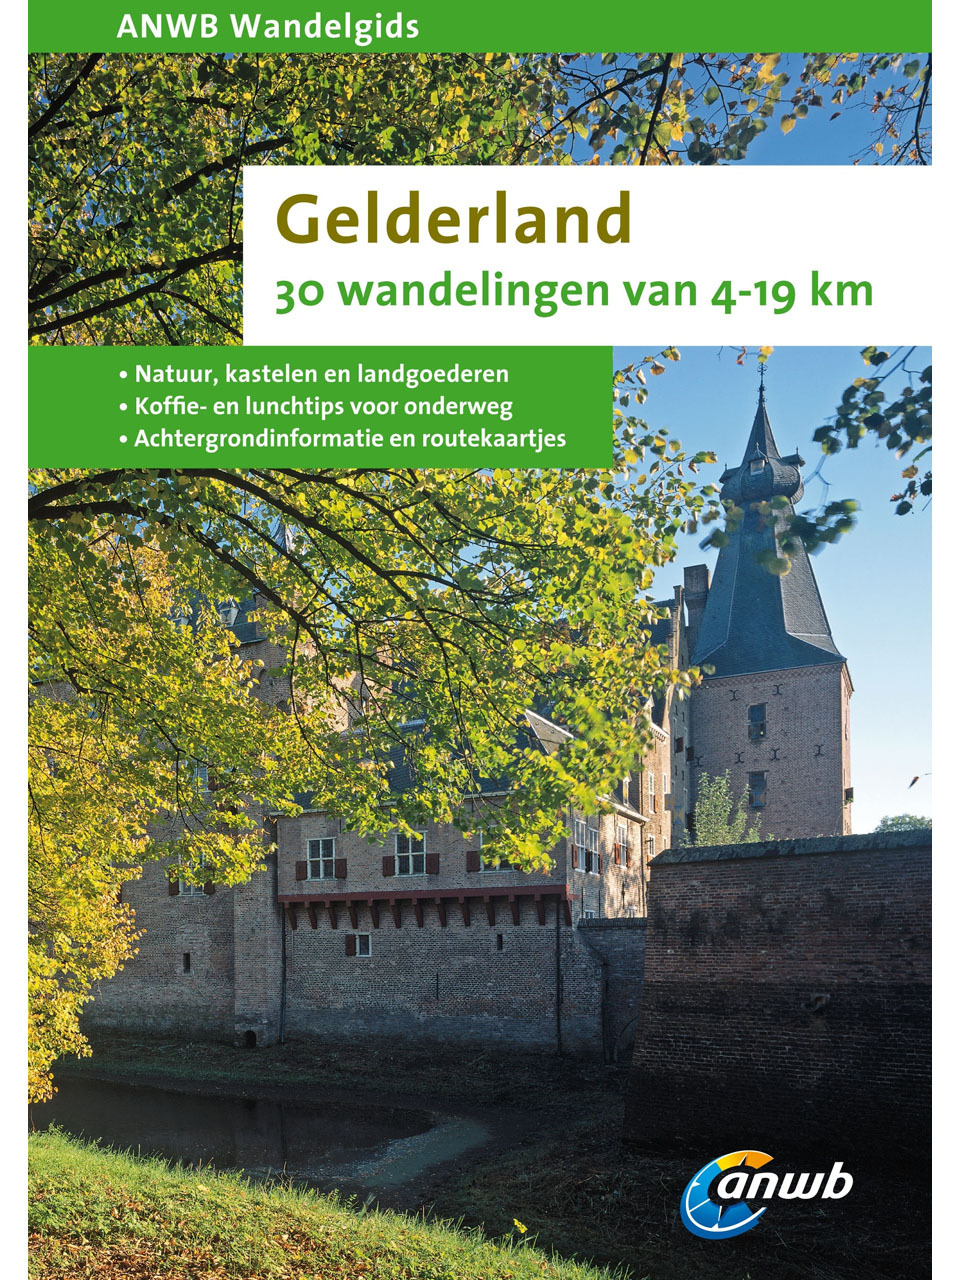 Wandelgids Gelderland   ANWB